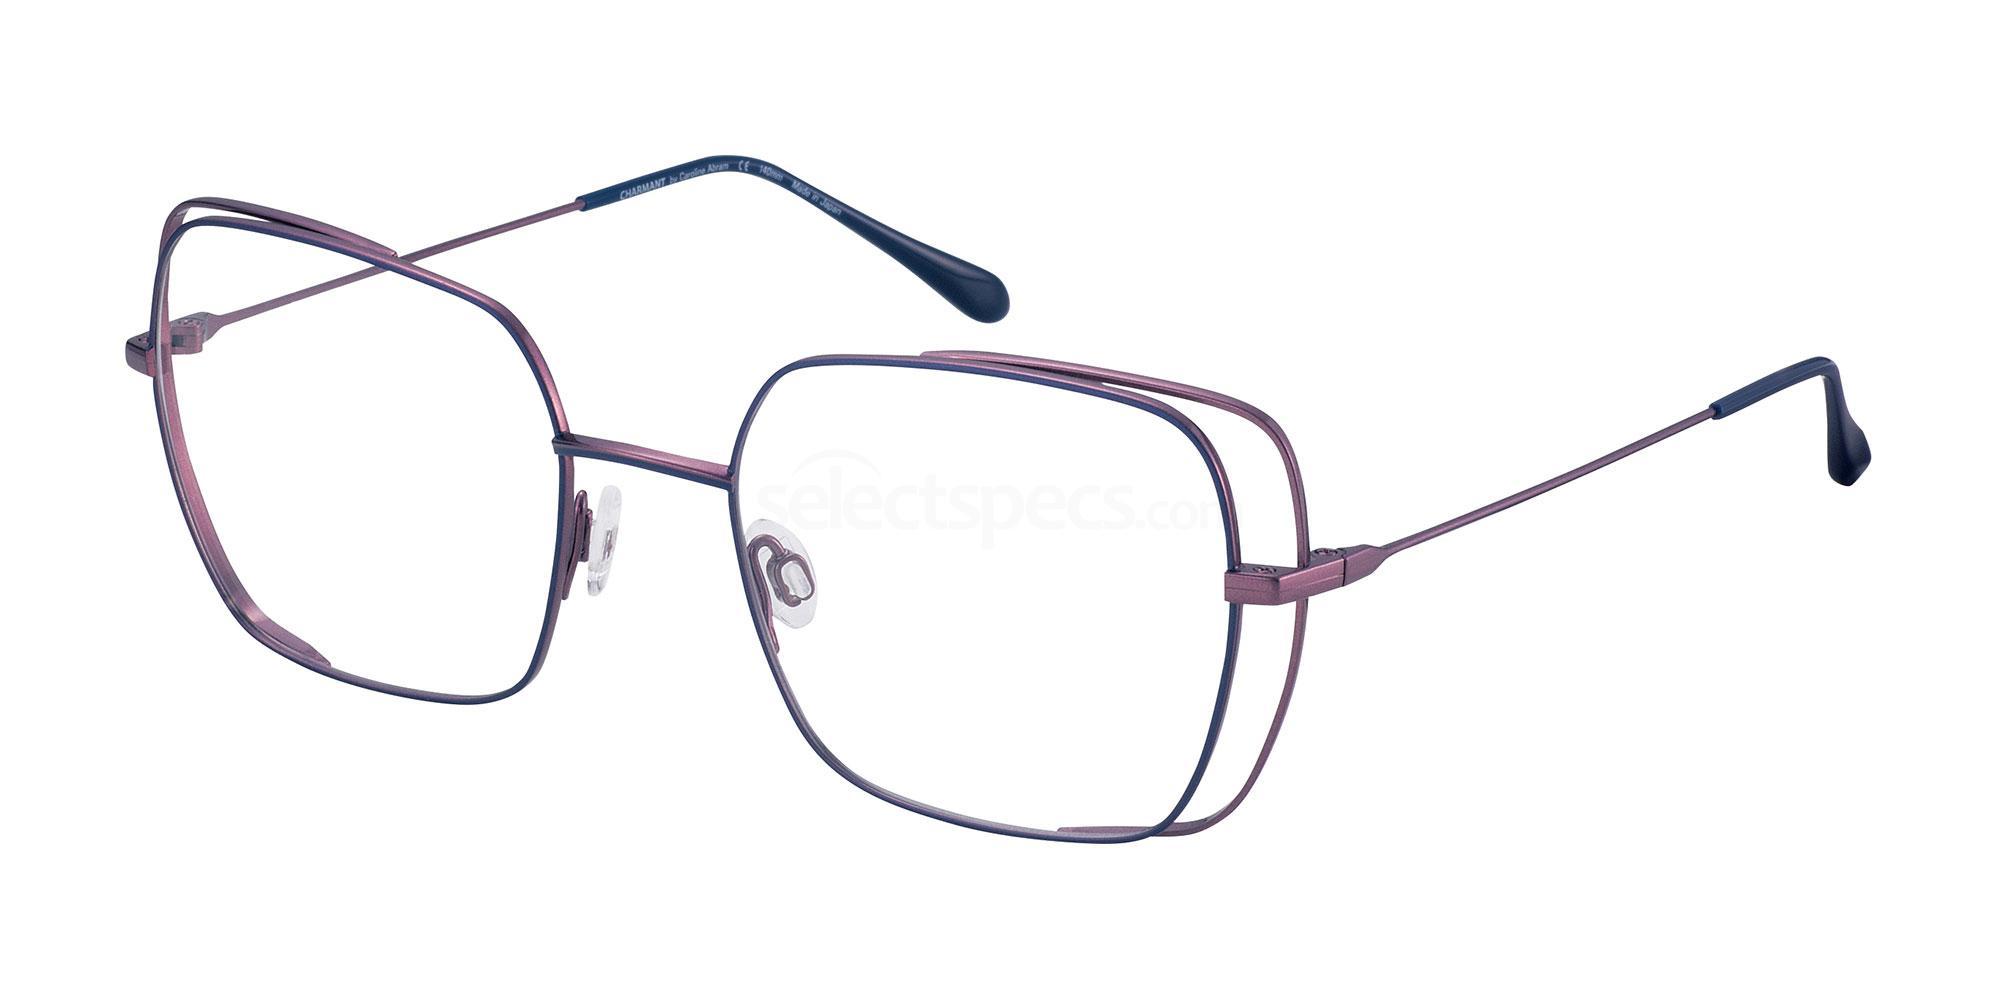 FU CH12572 Glasses, CHARMANT by Caroline Abram